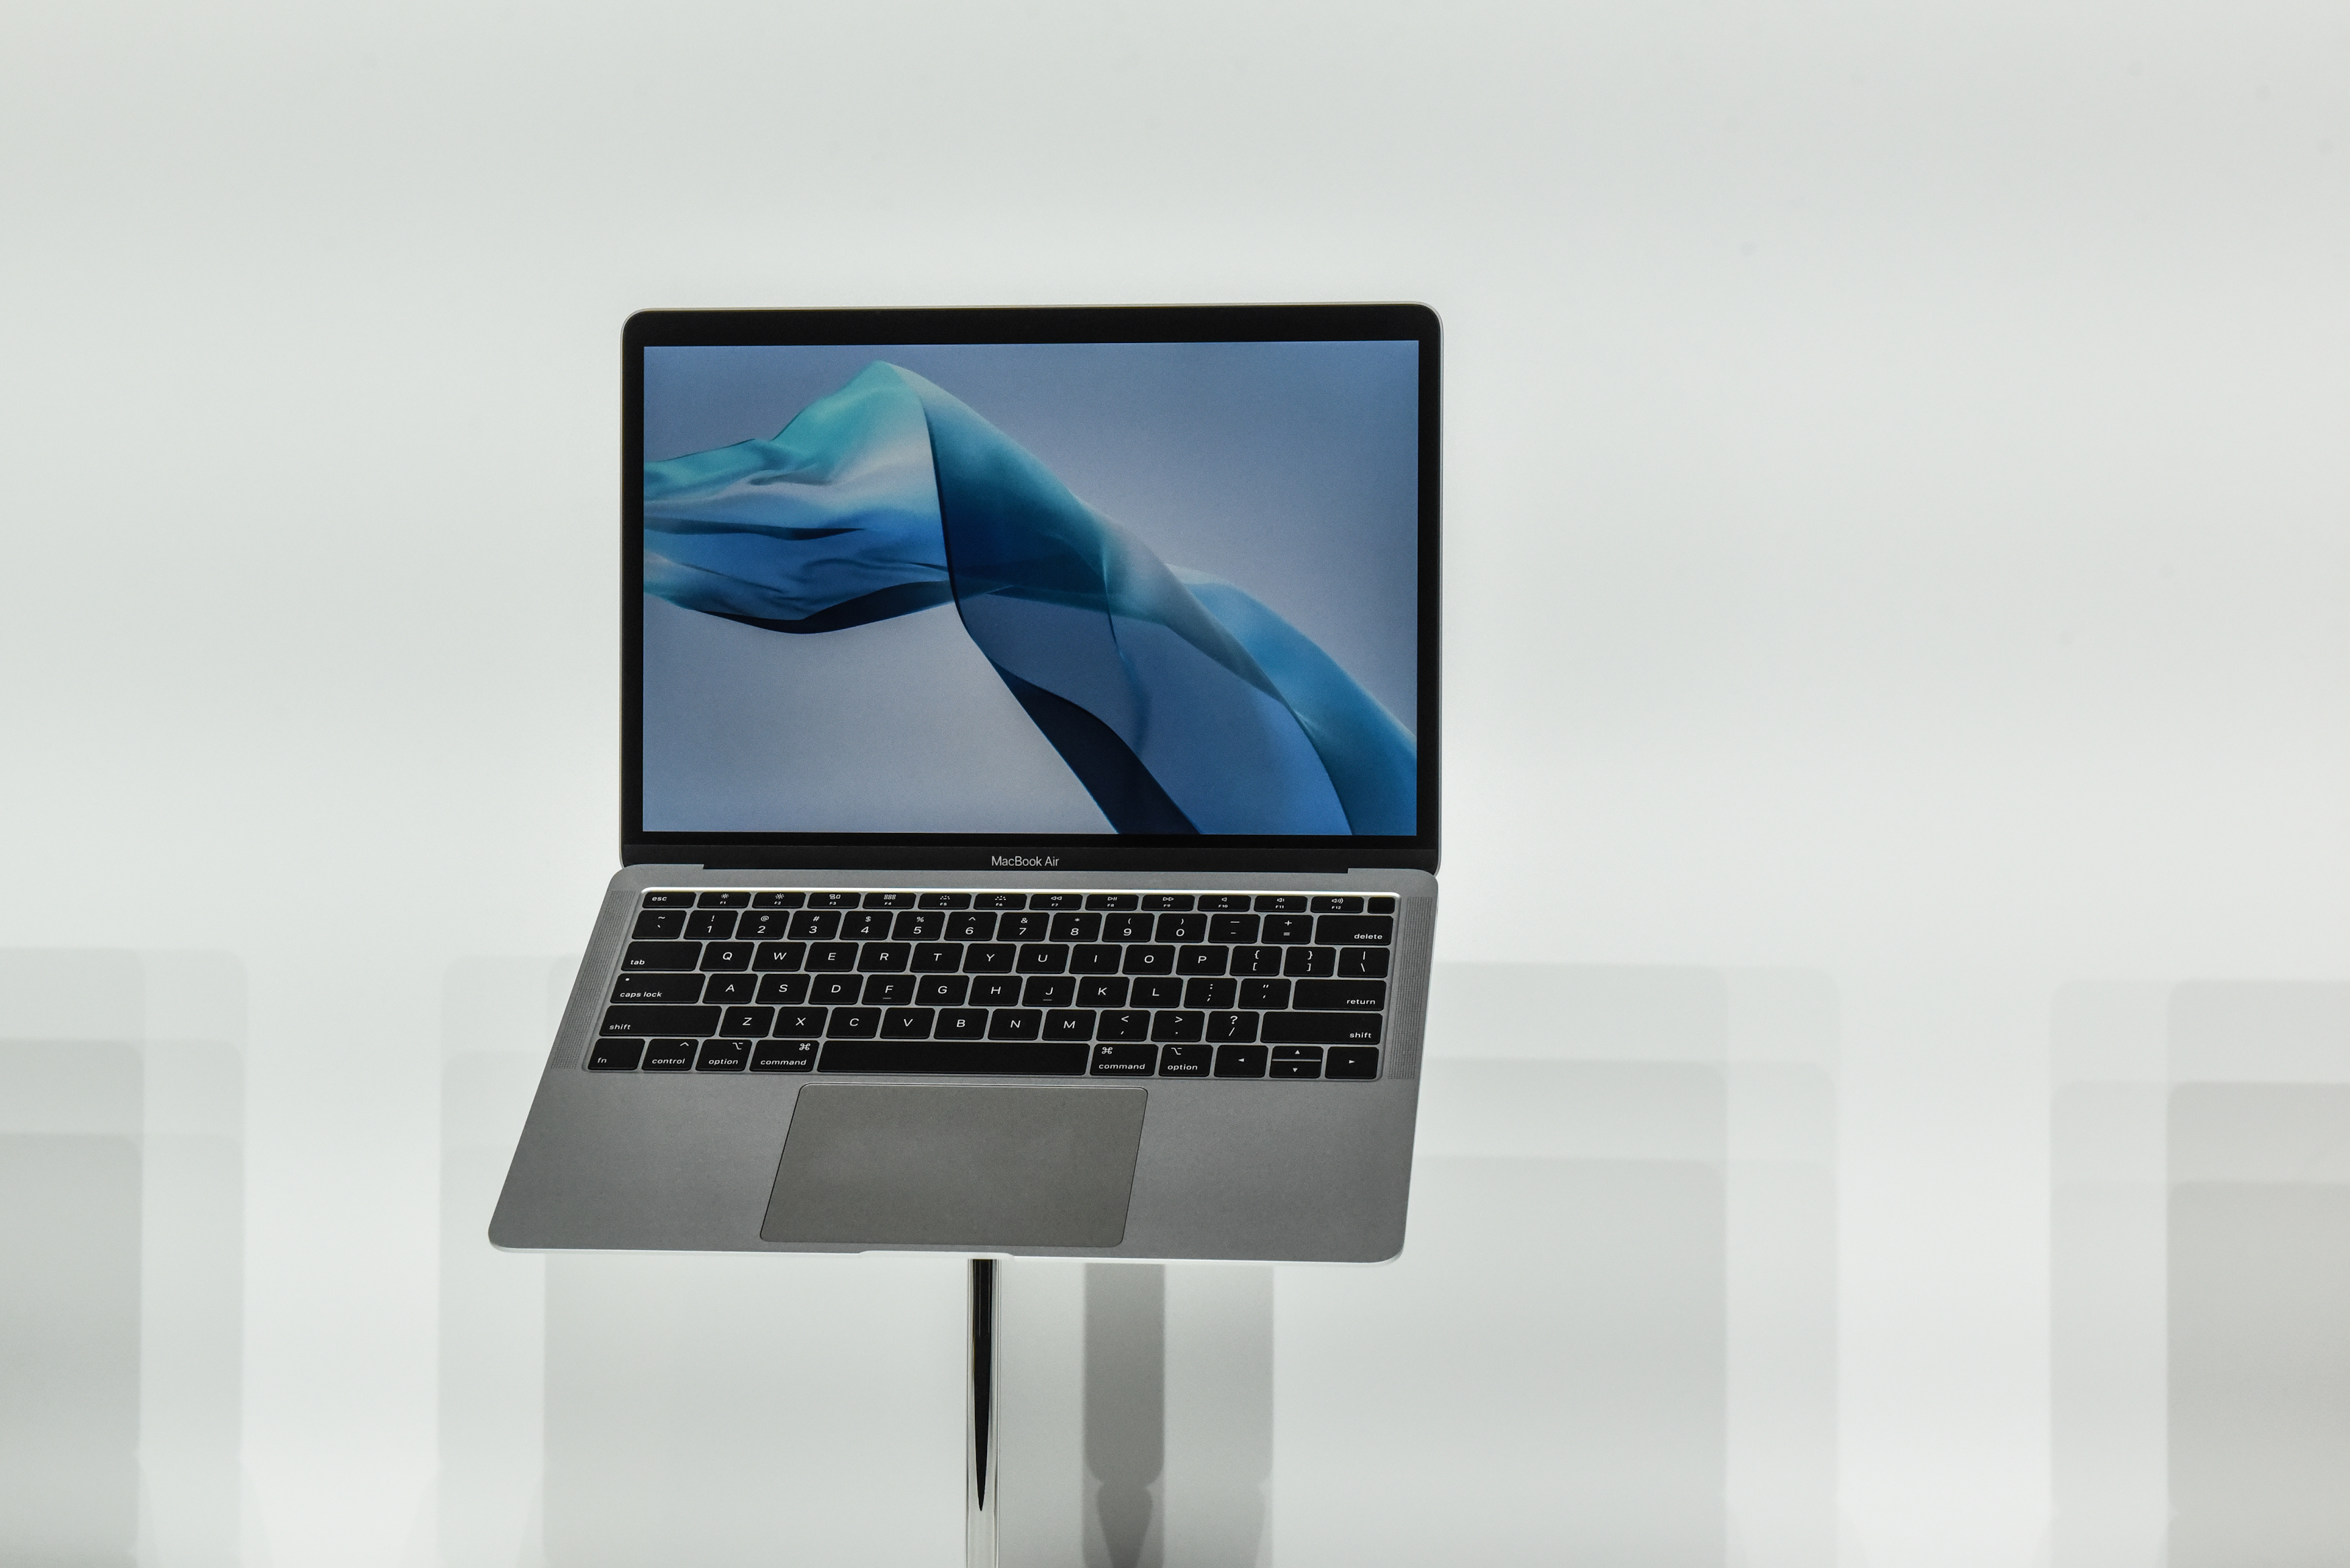 Amazon Prime Day 2019 Deals Today Apple Macbook Air Laptop Money